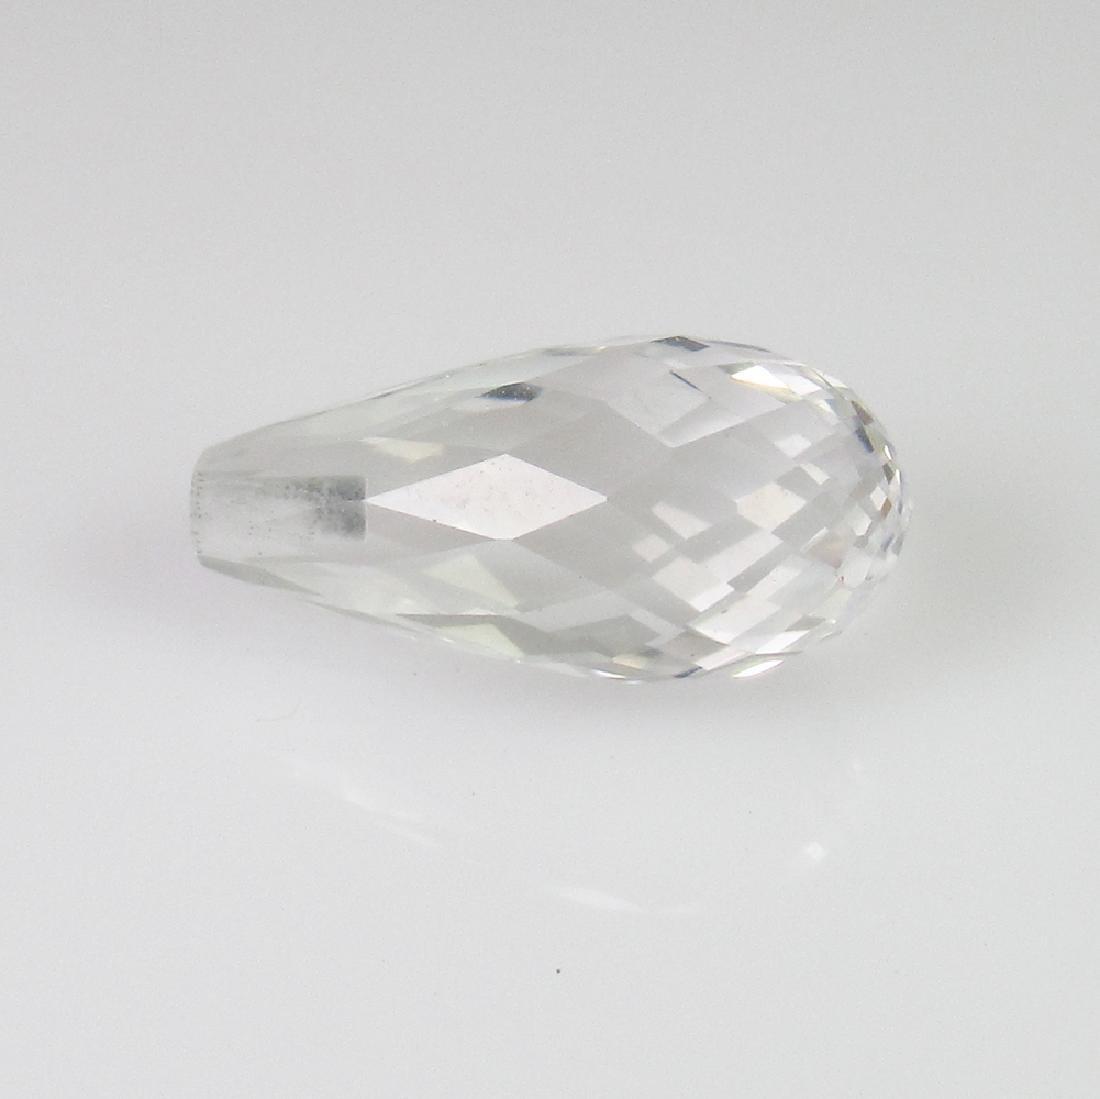 3.96 Ct Genuine White Topaz Pear Cut Drop